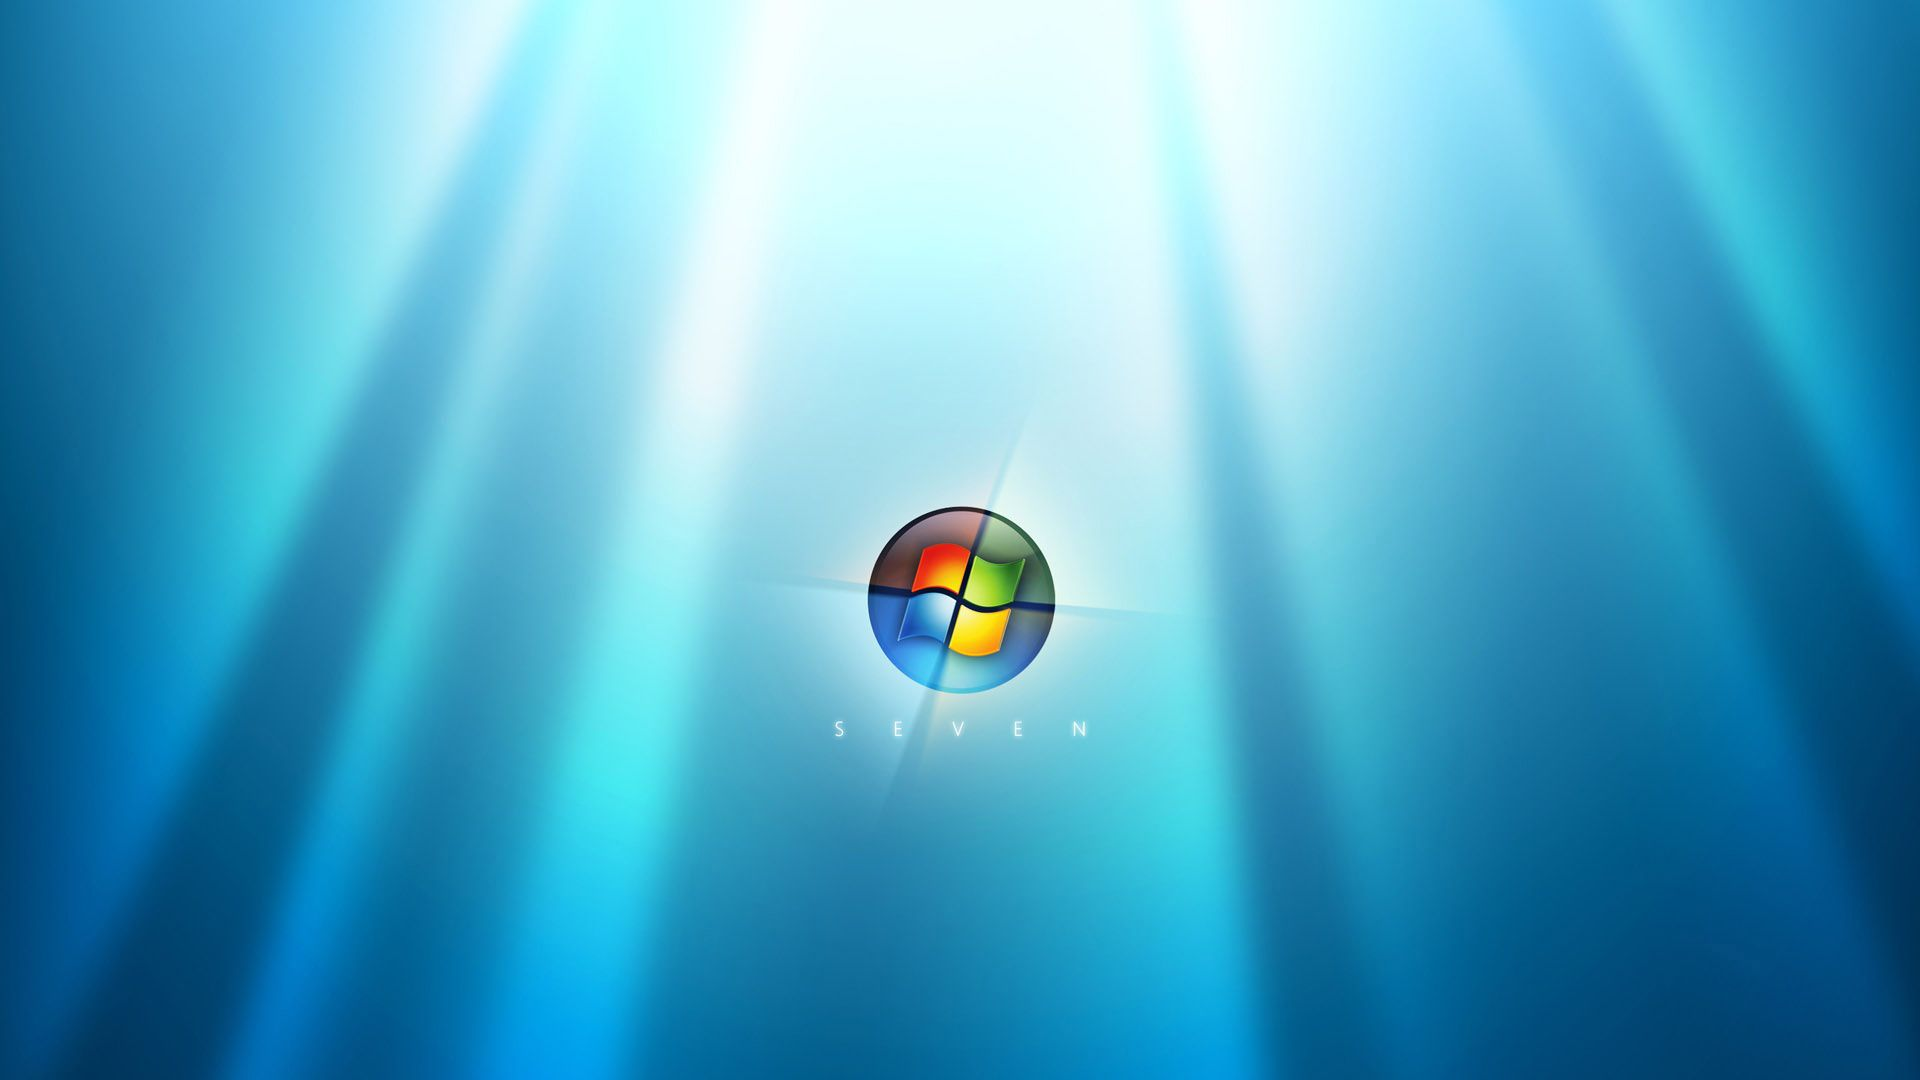 Standard Screensaver Windows 7